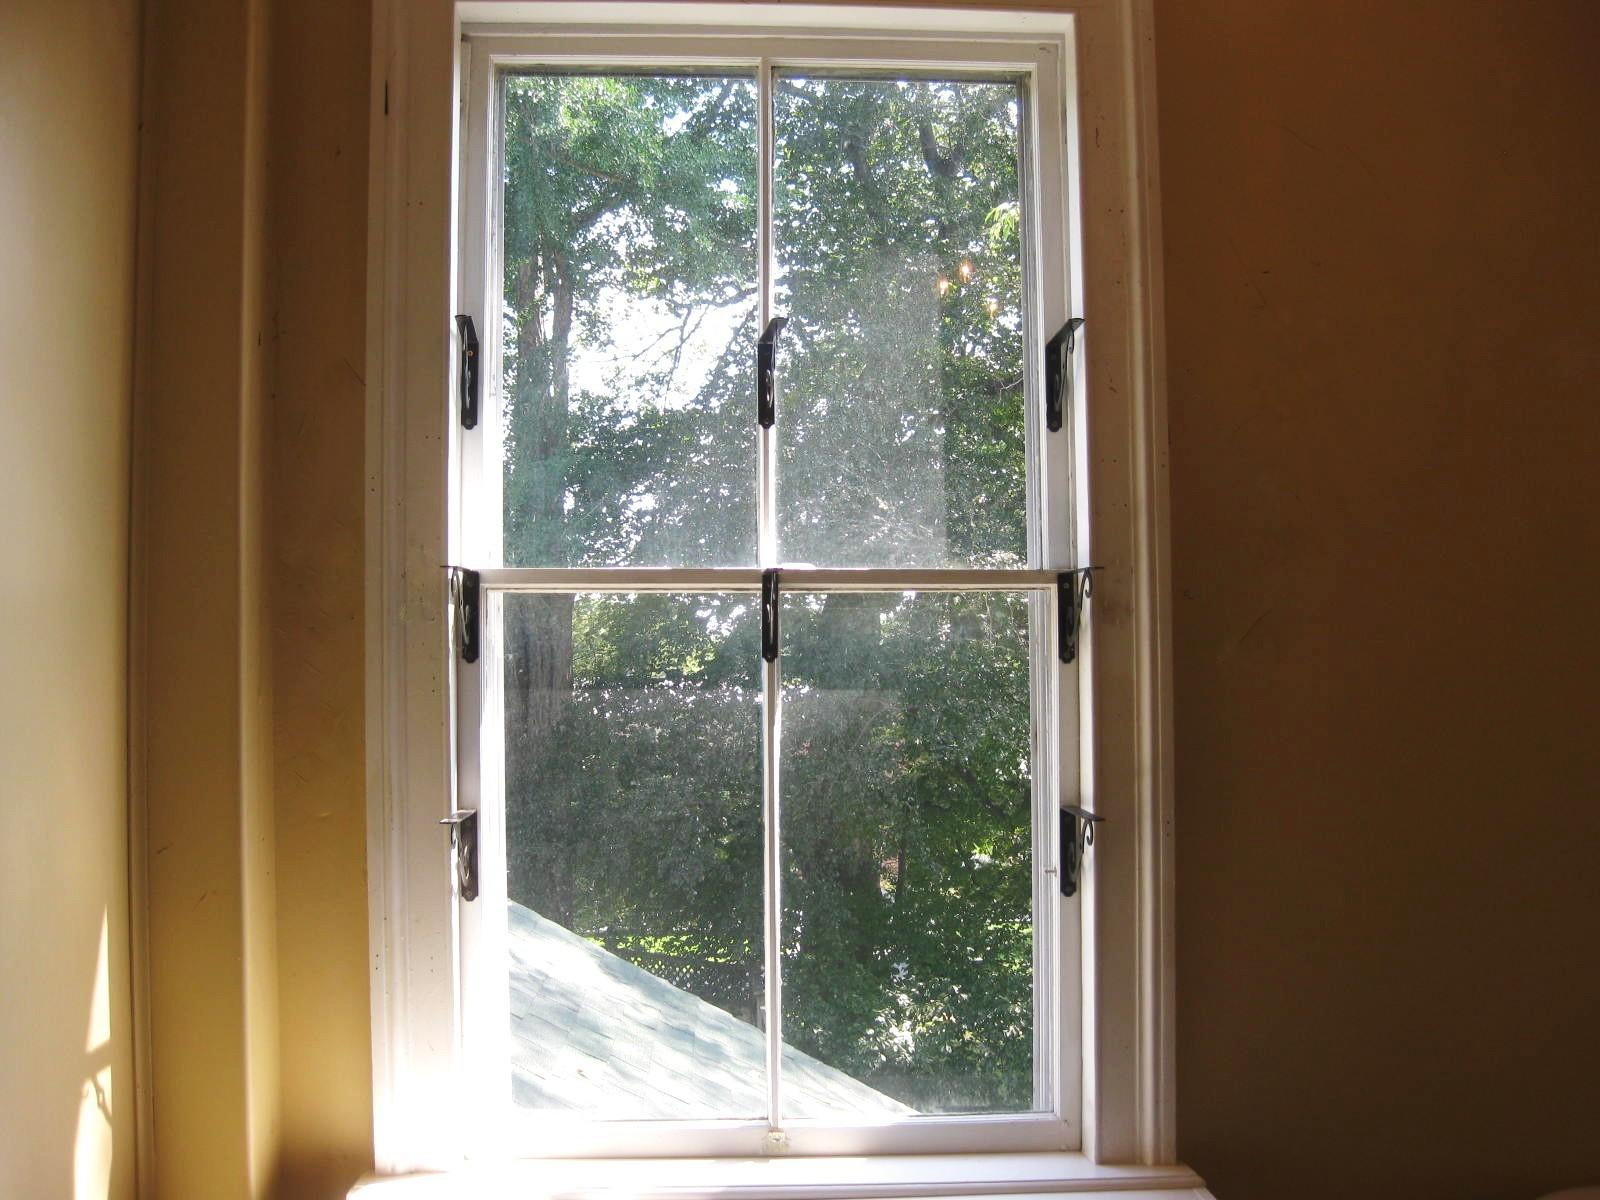 Design A Window Garden Kevin Lee Jacobs